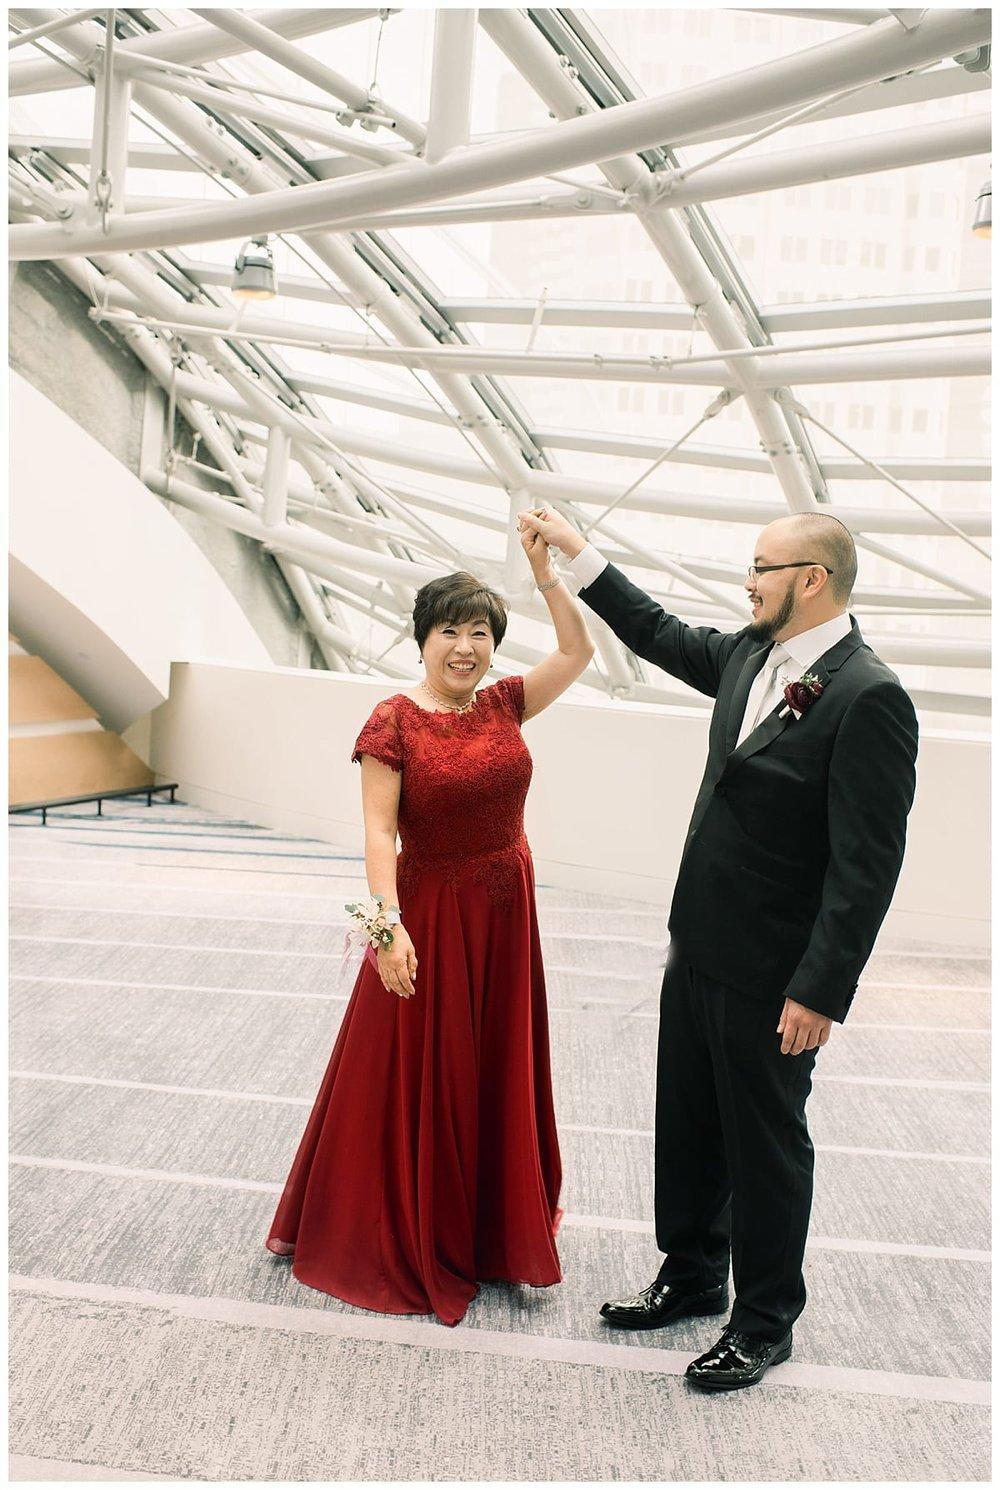 Intercontinental-Los-Angeles-Wedding-Carissa-Woo-Photography_0033.jpg